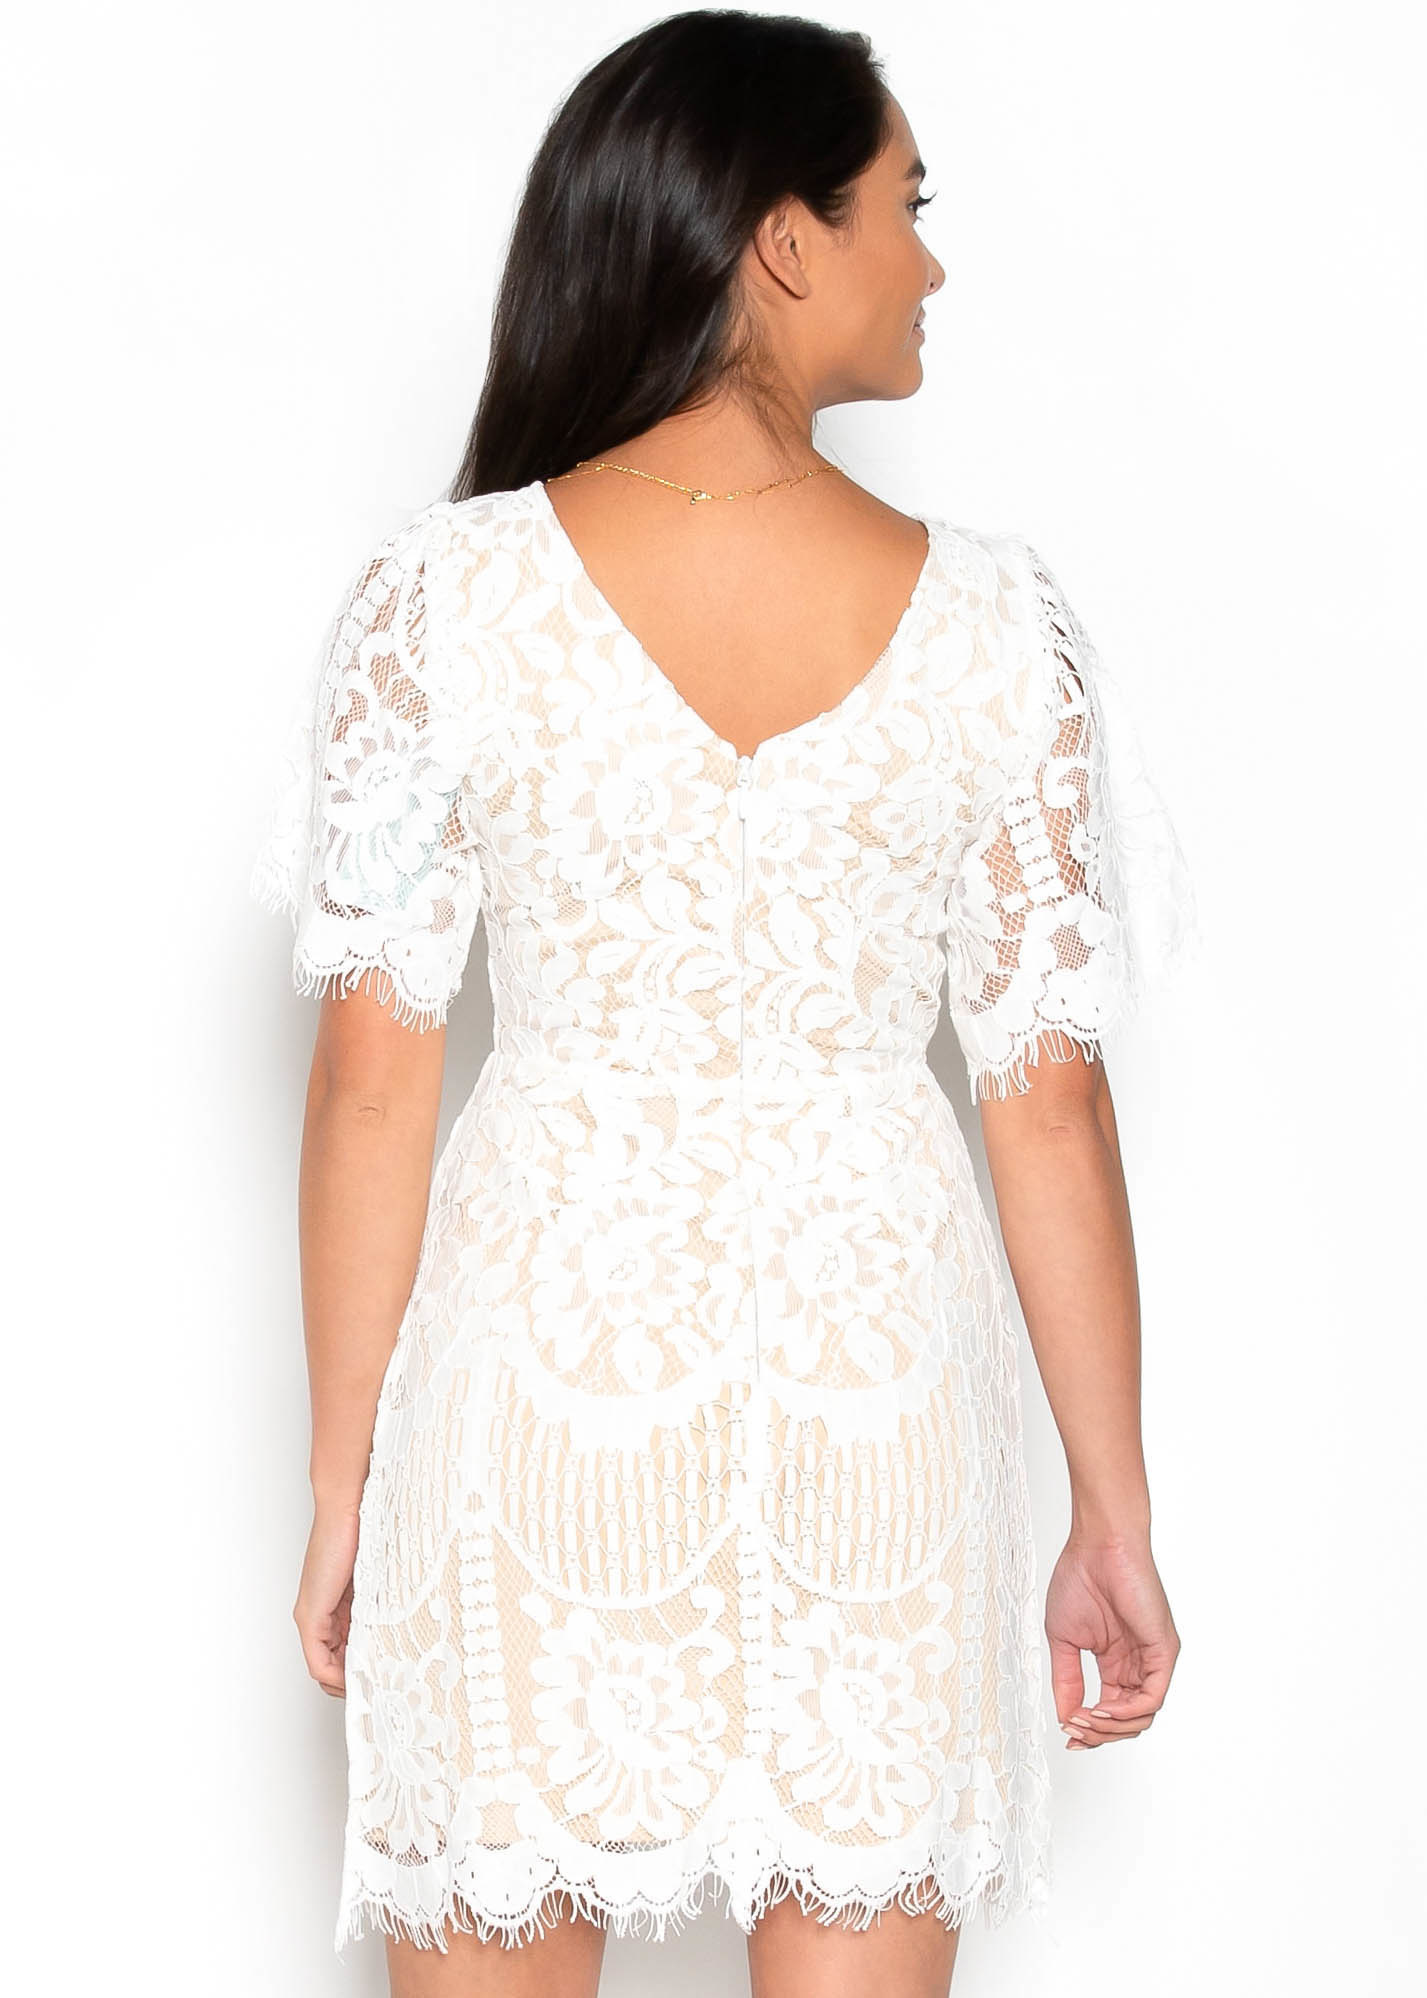 CALL IT LOVE WHITE LACE DRESS